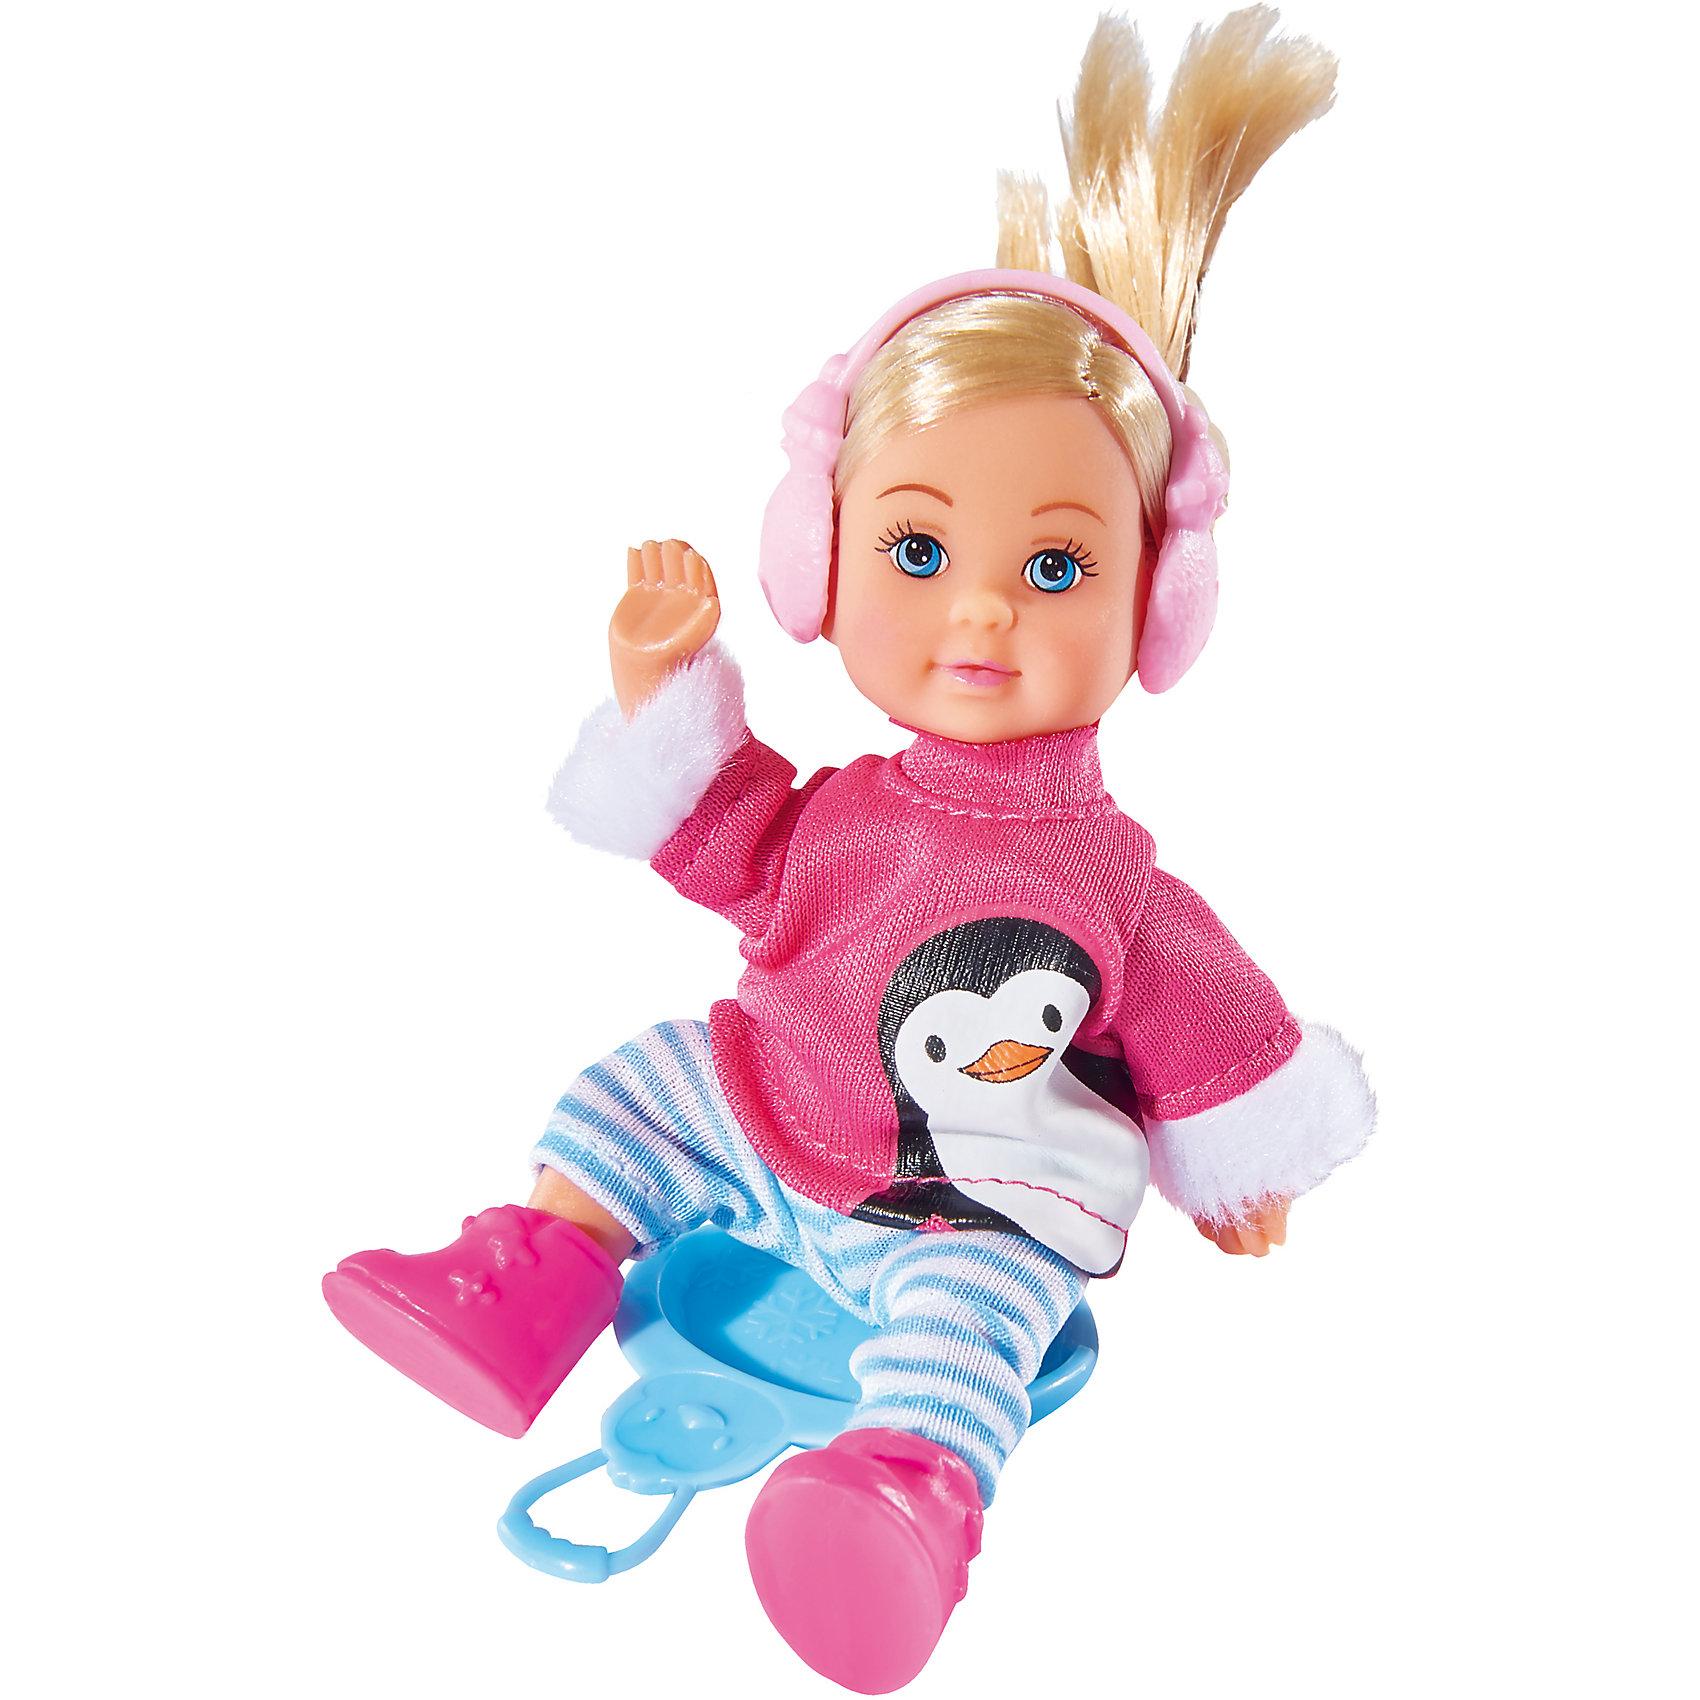 Simba Кукла Еви в зимнем костюме,12 см, Simba фигурки sweet home интерьерная кукла мальчик в зимнем костюме